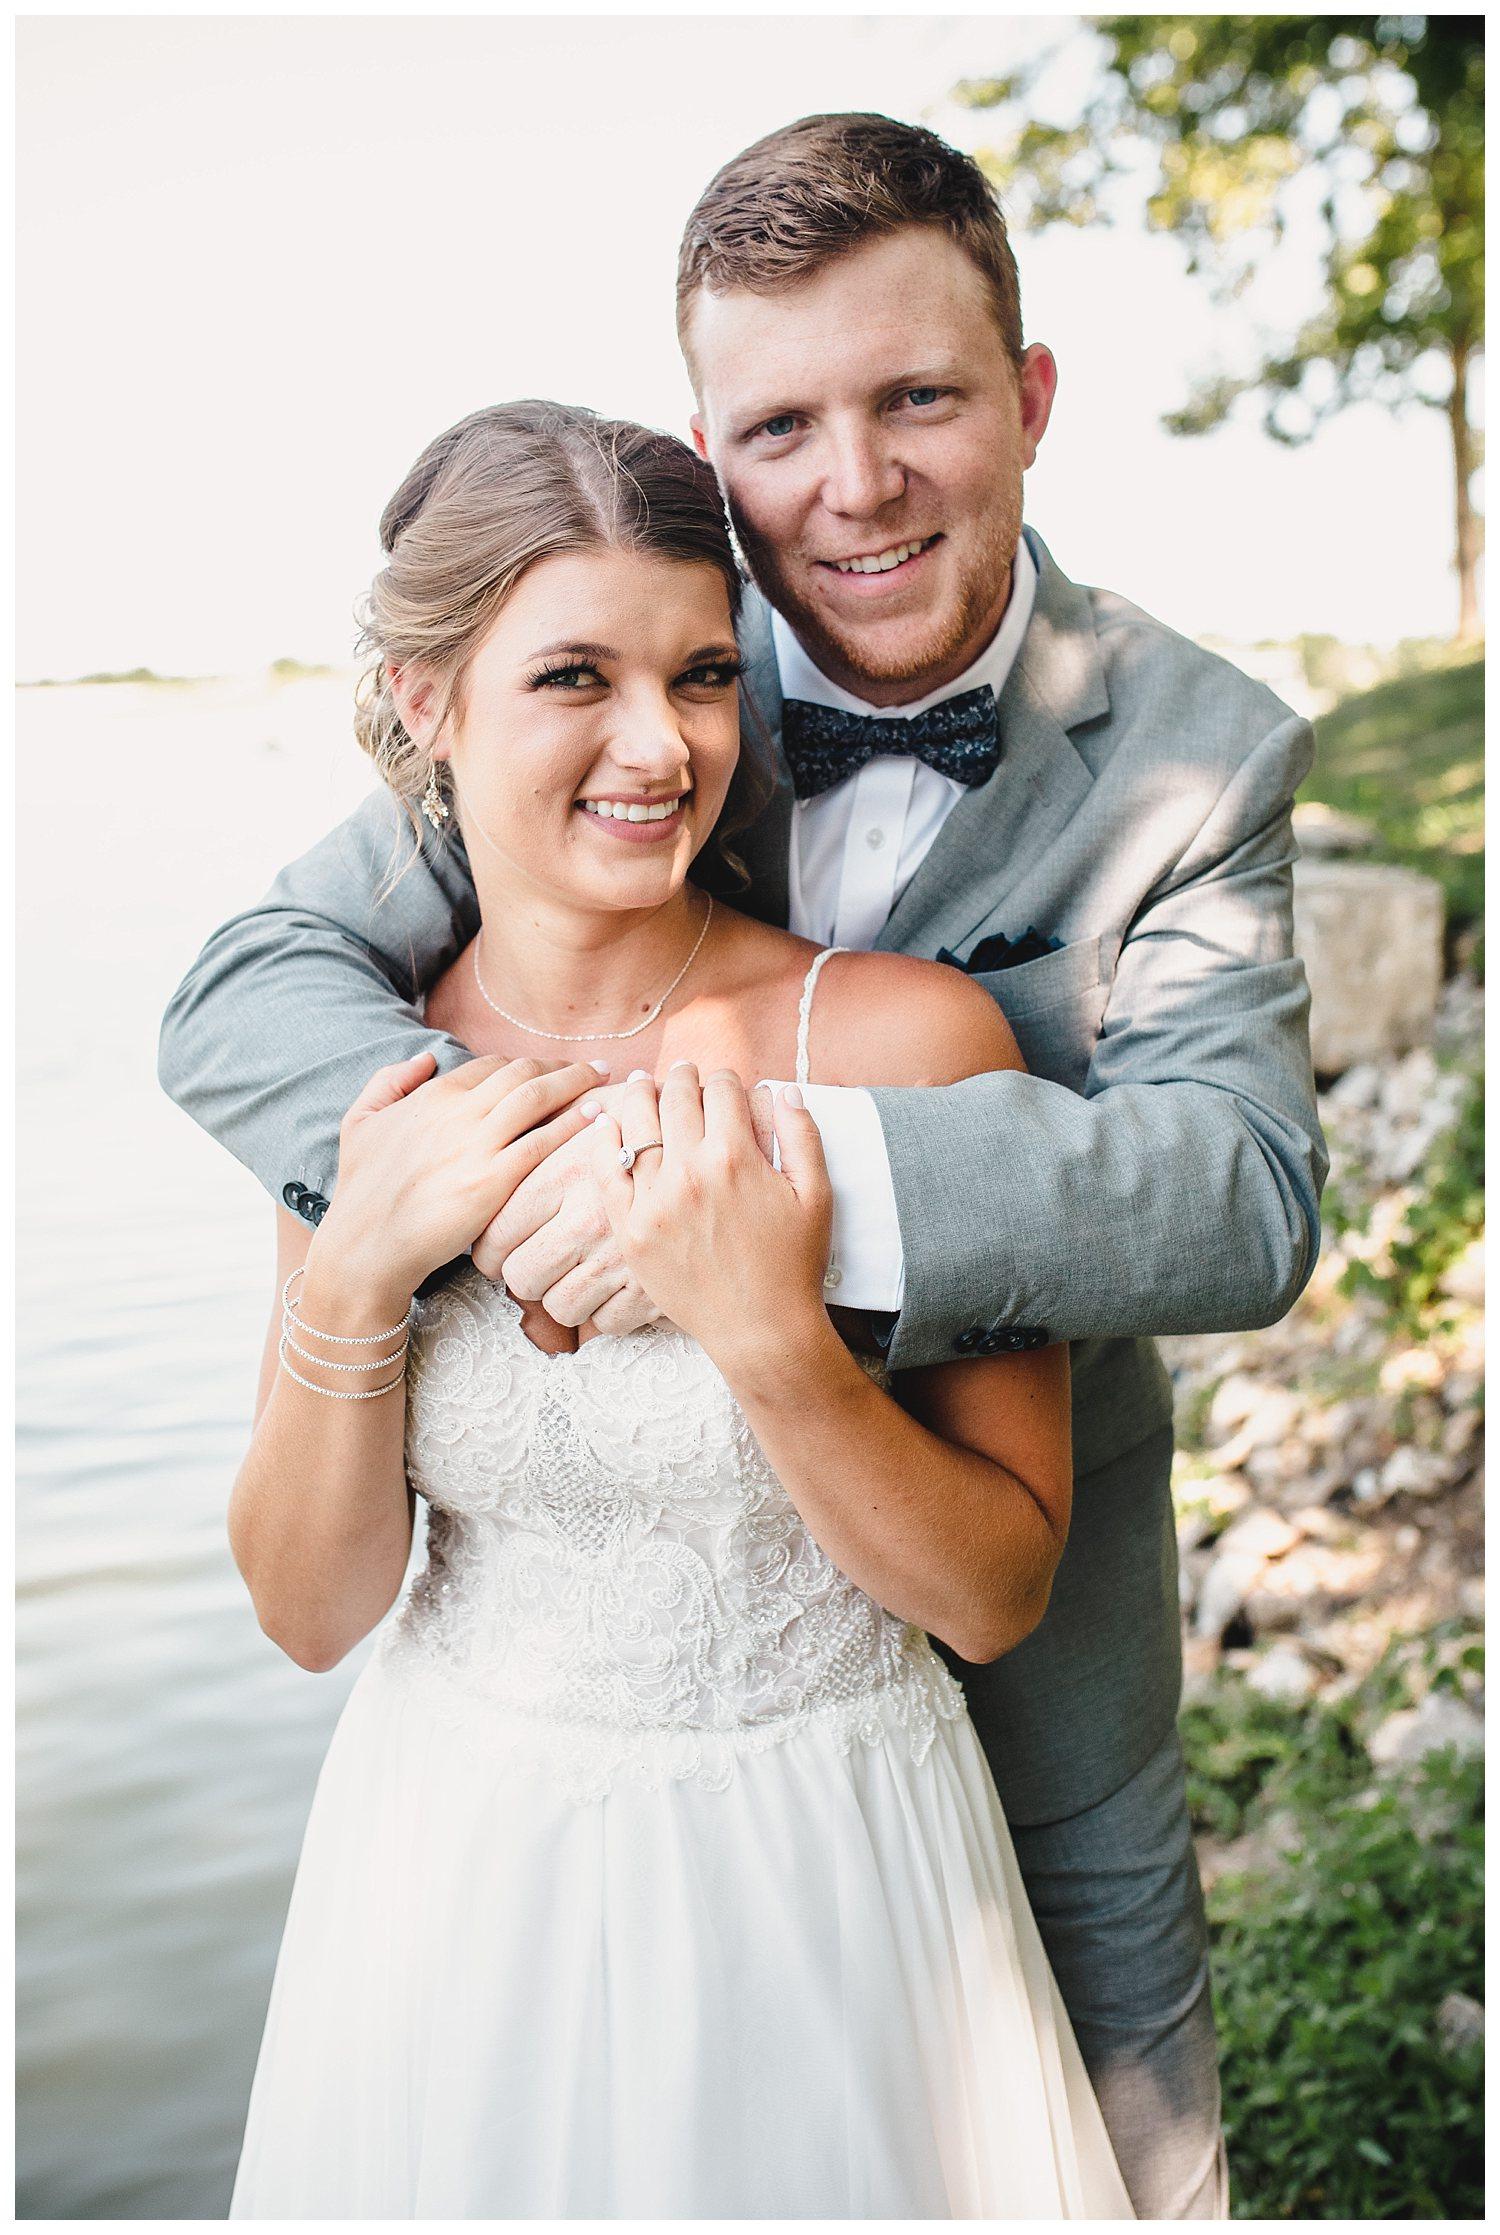 Kelsey_Diane_Photography_Kansas_City_Engagement_Wedding_Photographer_Midwest_Traveling_Missouri_Lee_Andrew_Hall_And_Garden_Blue_Springs_Wedding_Clayton_Kimberly_Summer_Wedding_0824.jpg